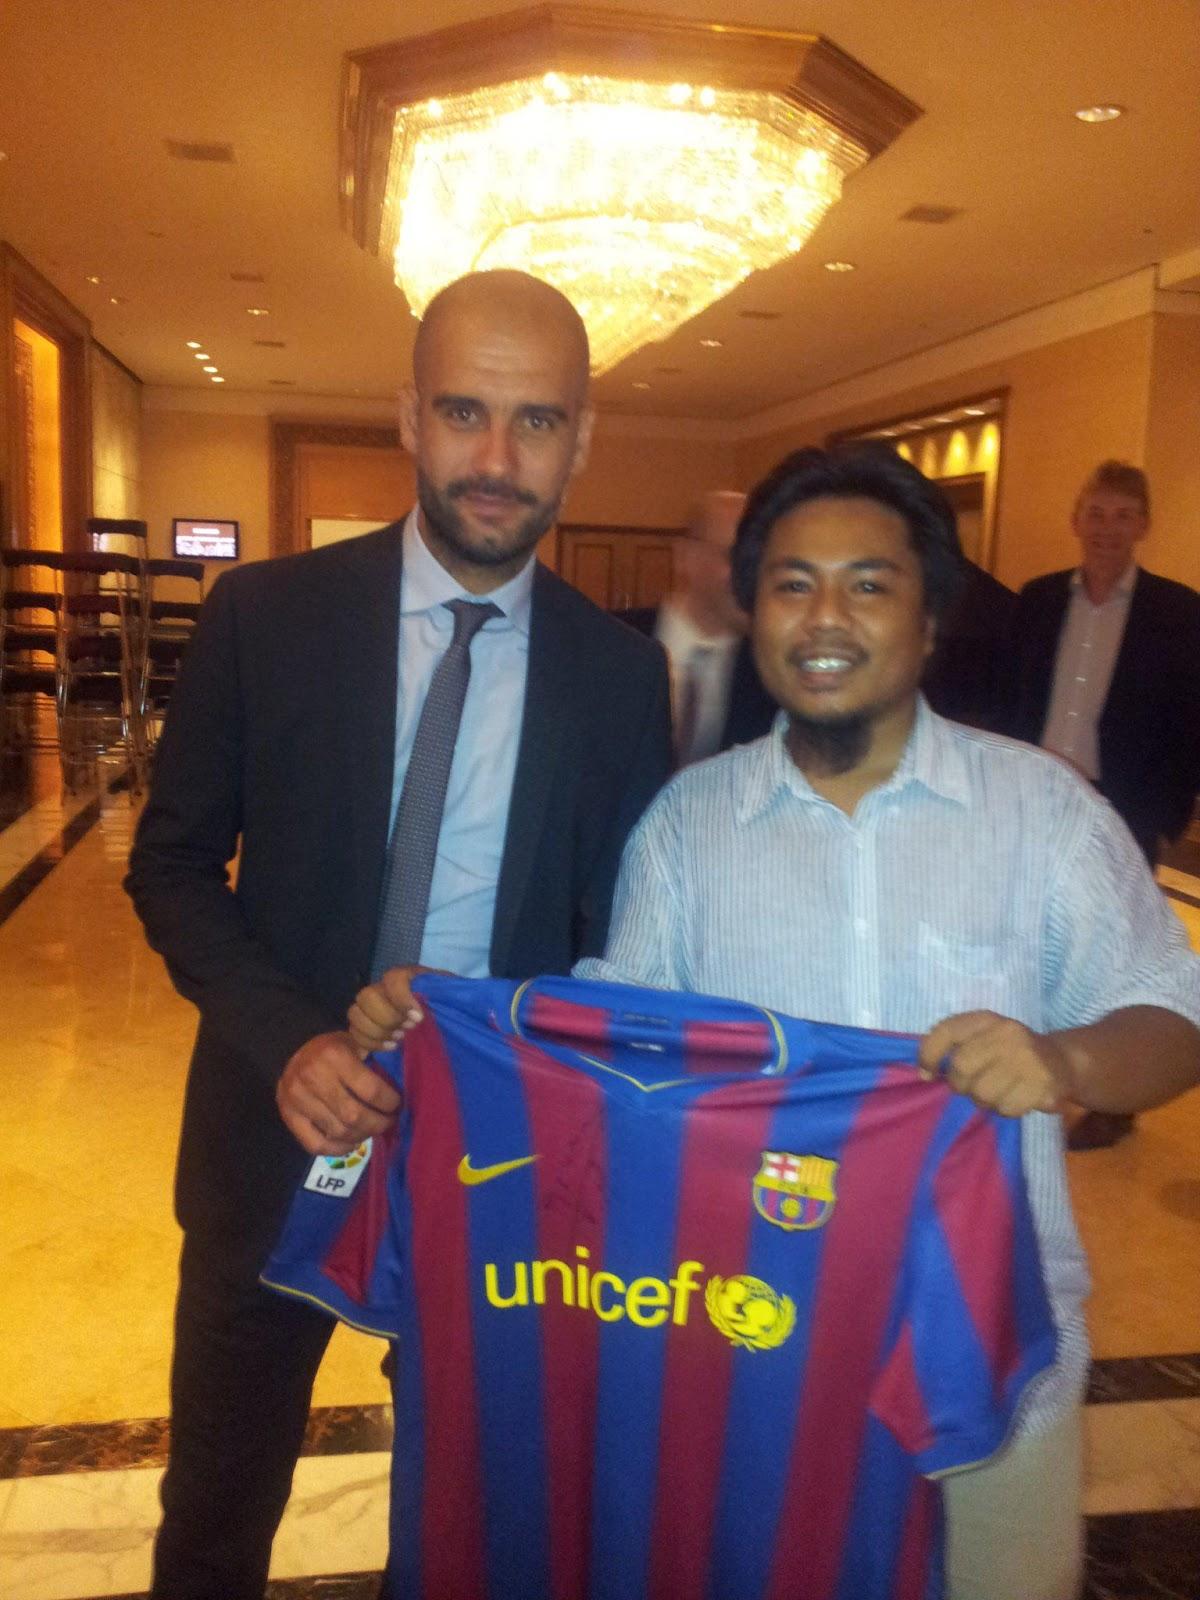 Guardiola Barcelona Jersey Pep Guardiola Signed Barcelona